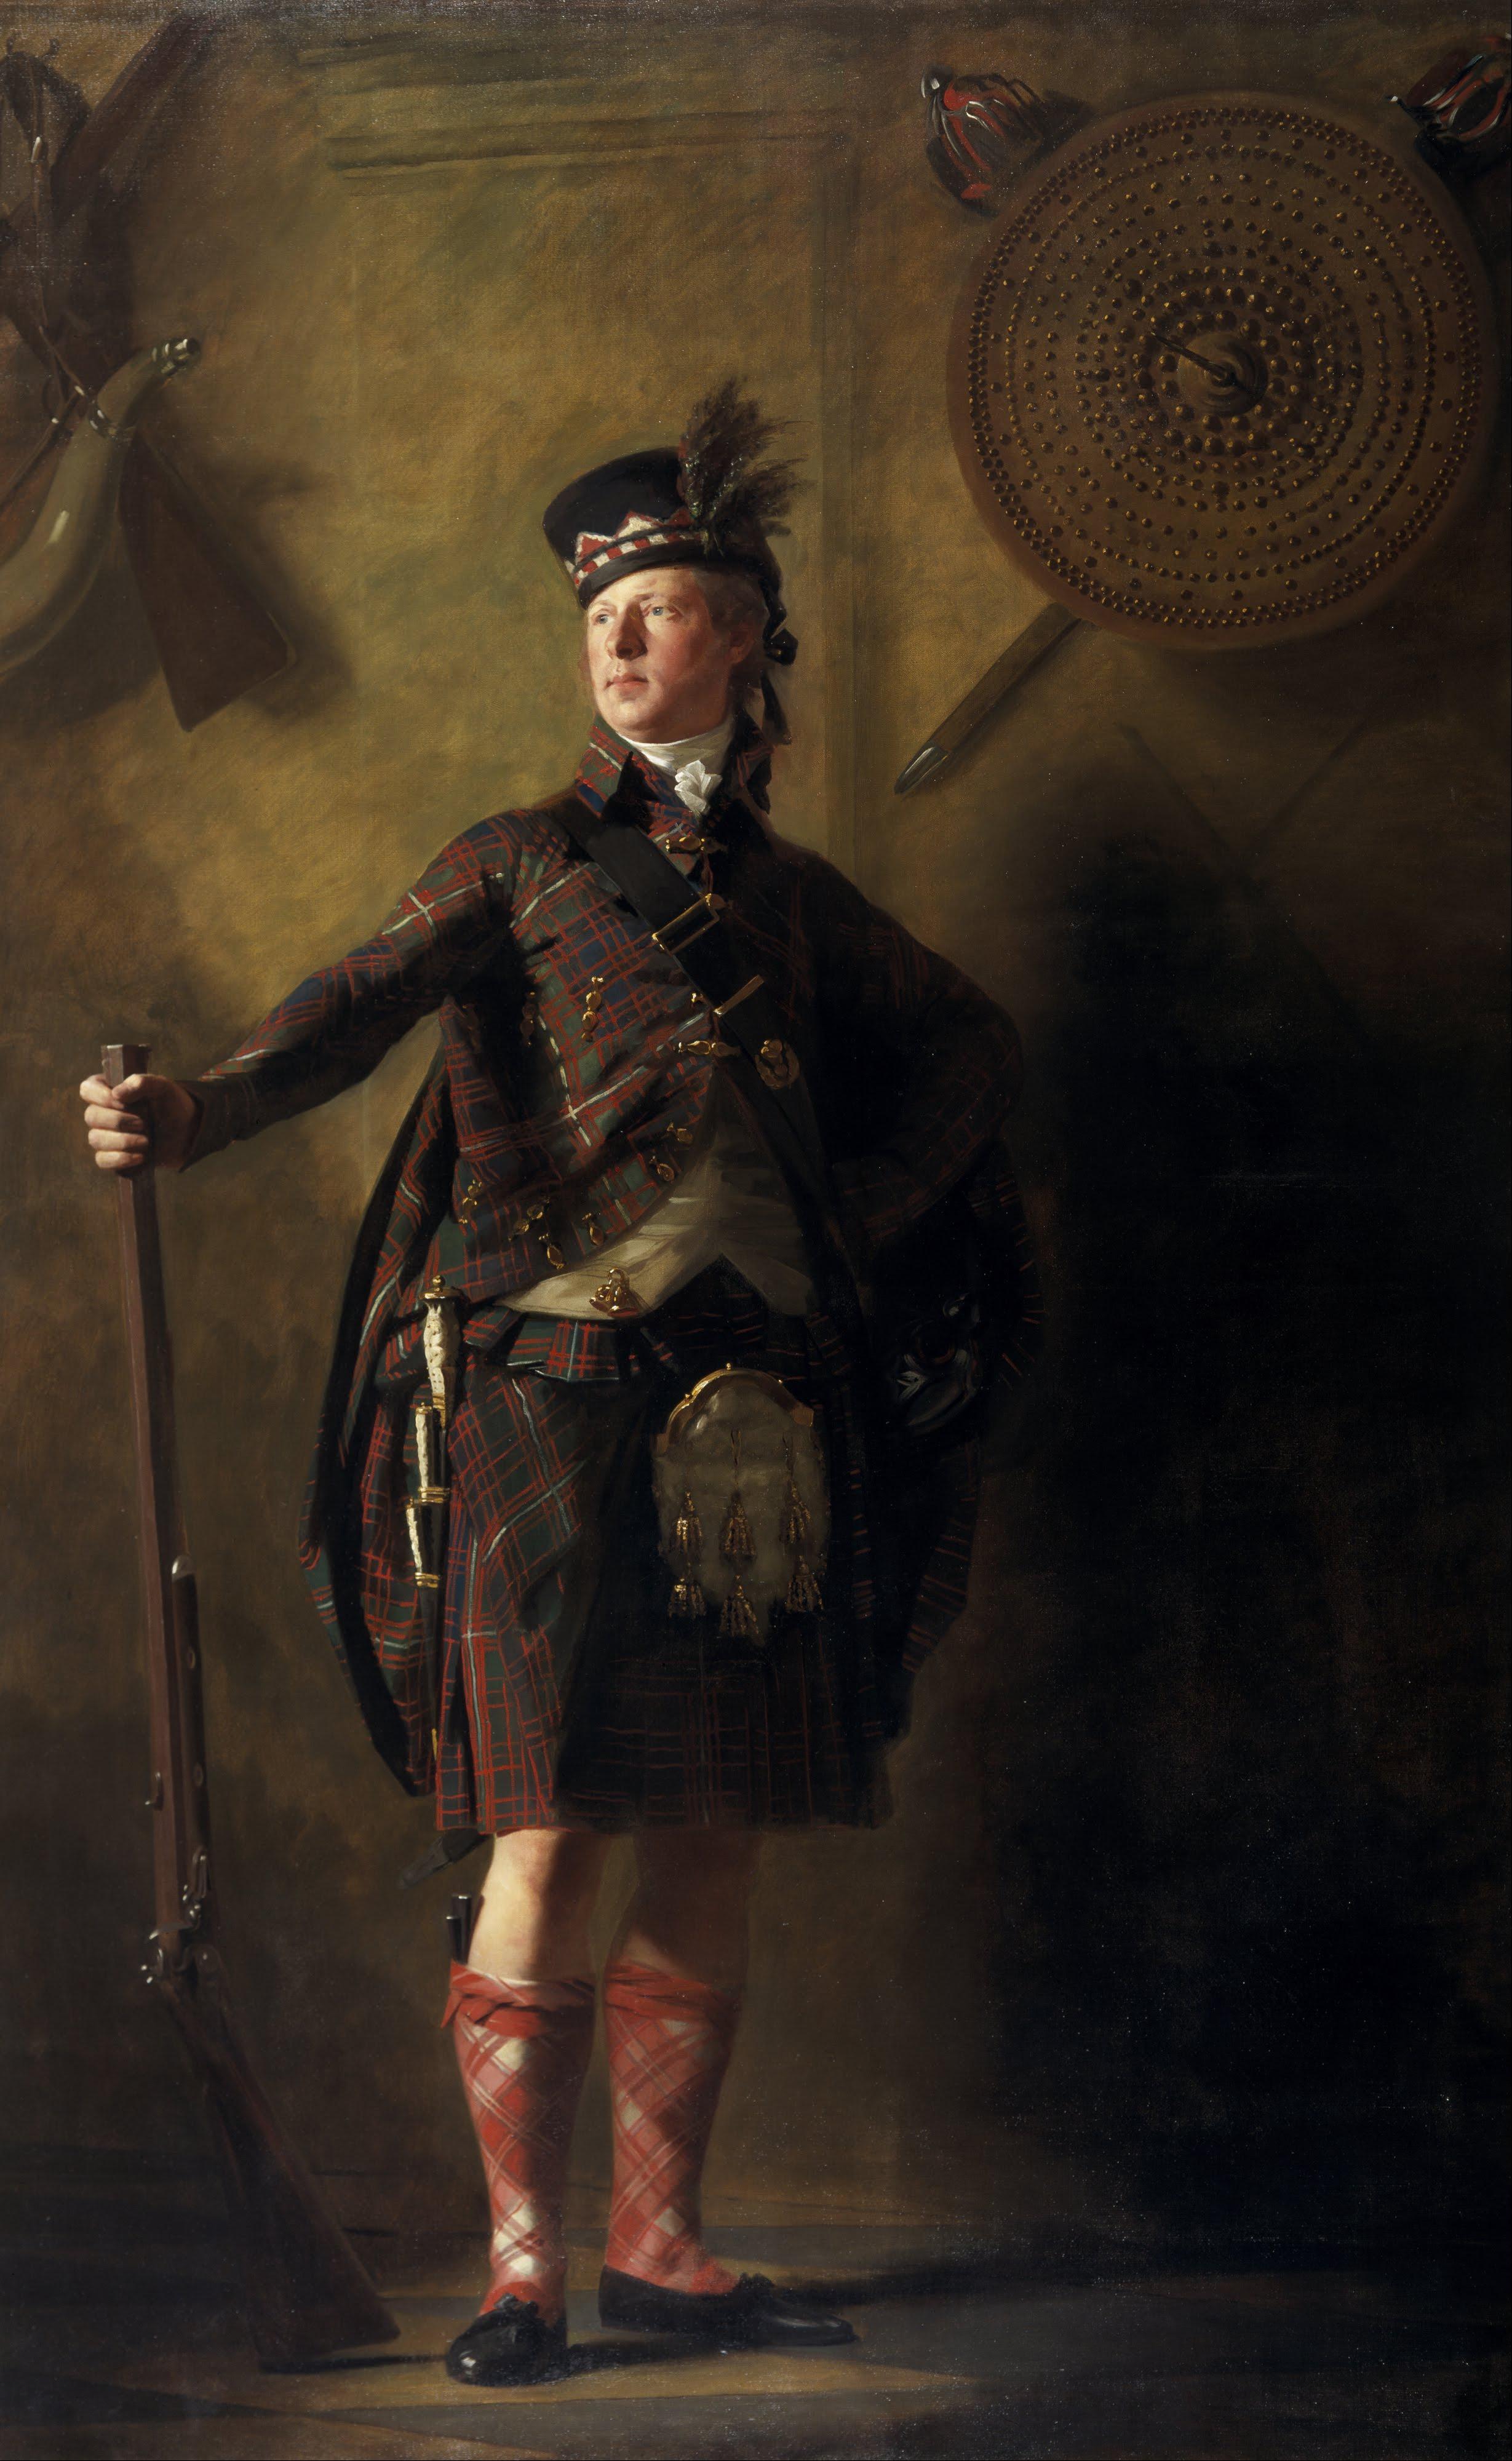 sir richmond campbell shakespear 1812 1861 his